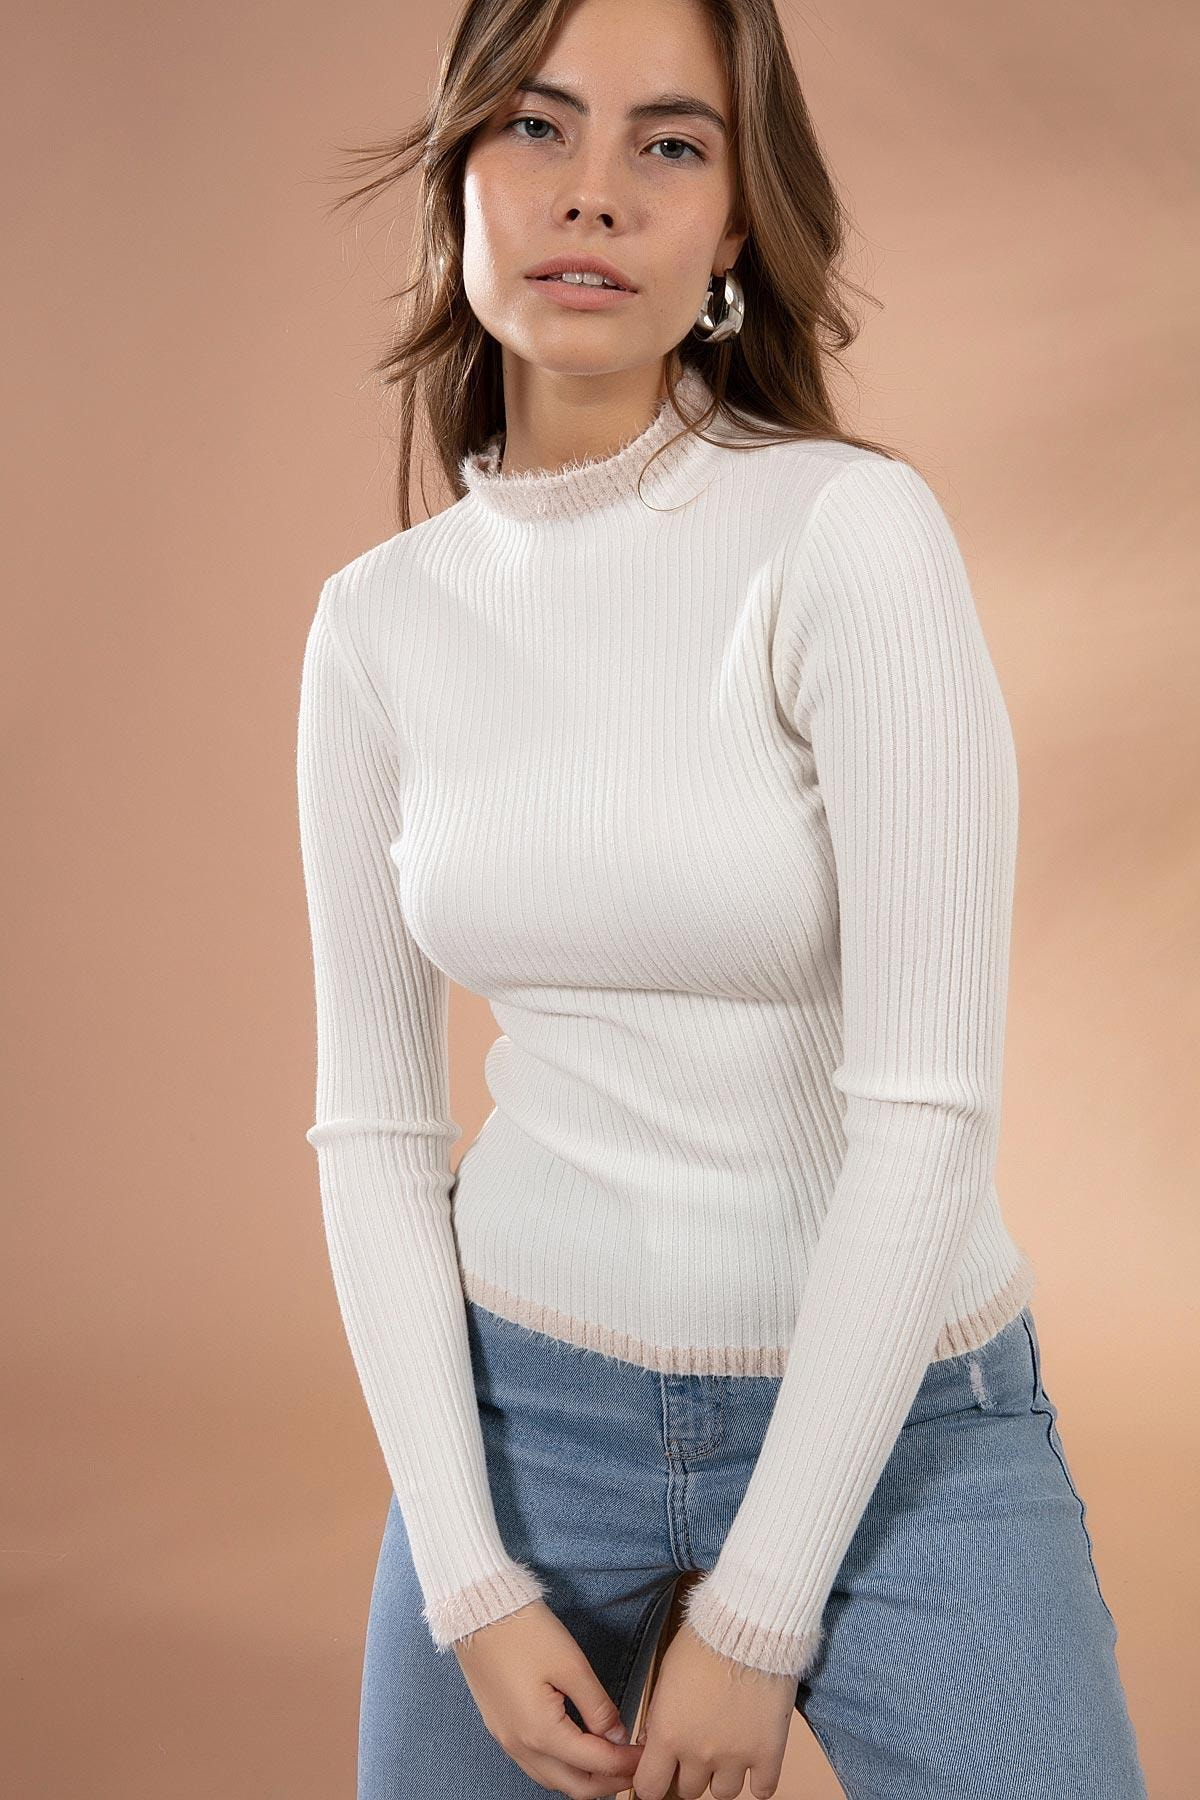 Pattaya Kadın Yaka Detayı Tüylü Fitilli Triko Kazak Y20w117-16811 1